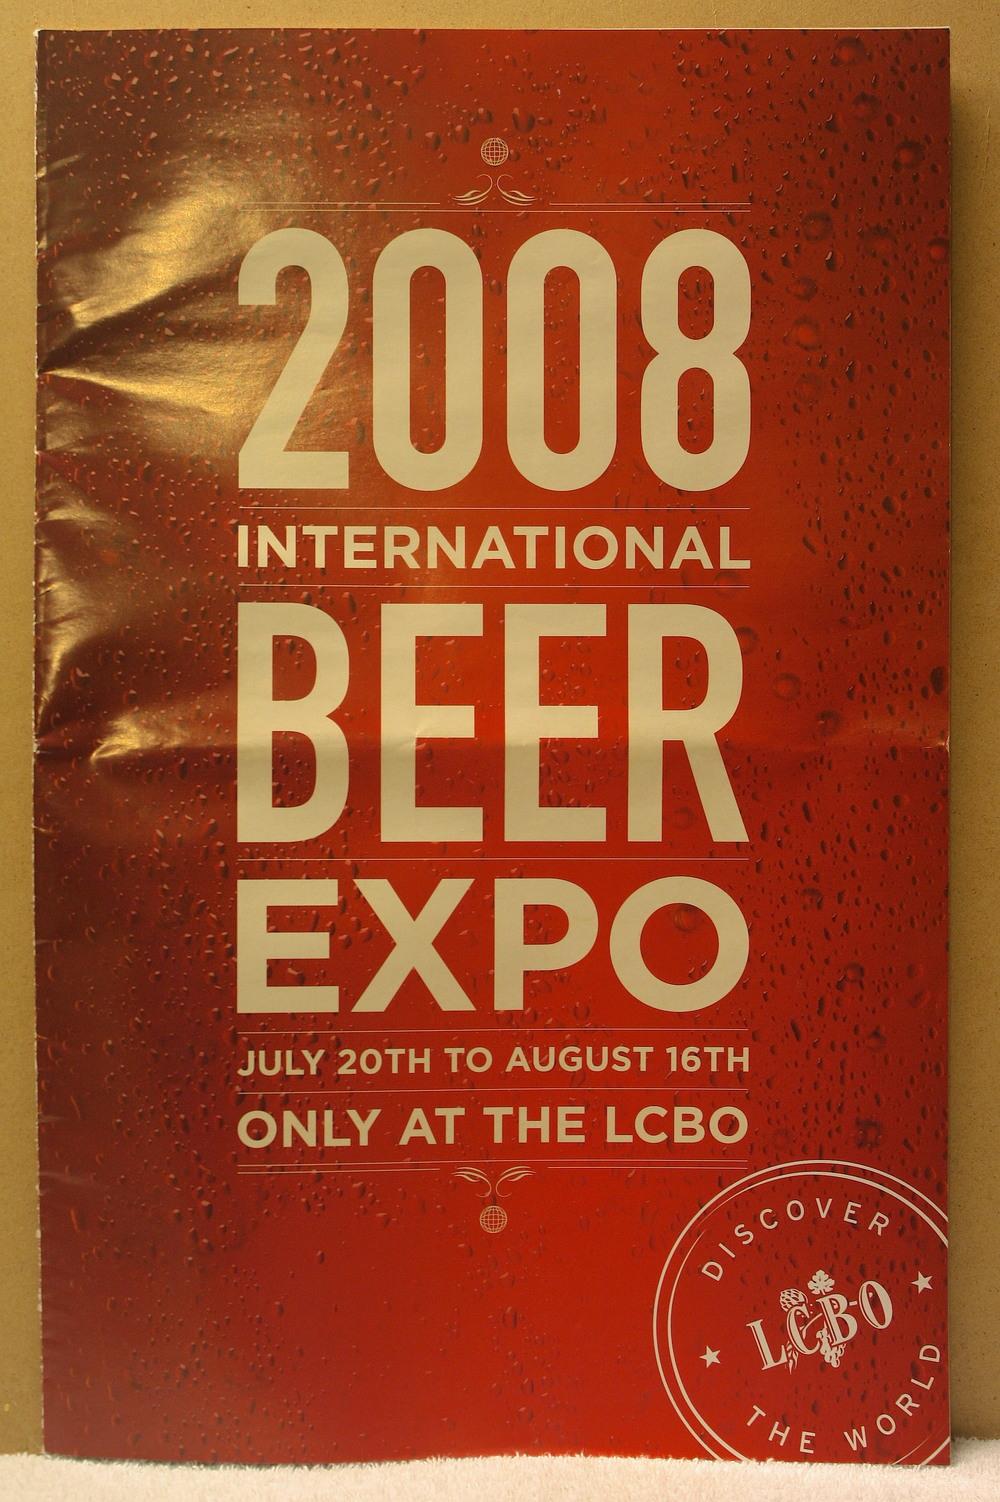 Internation Beer Expo (2008)